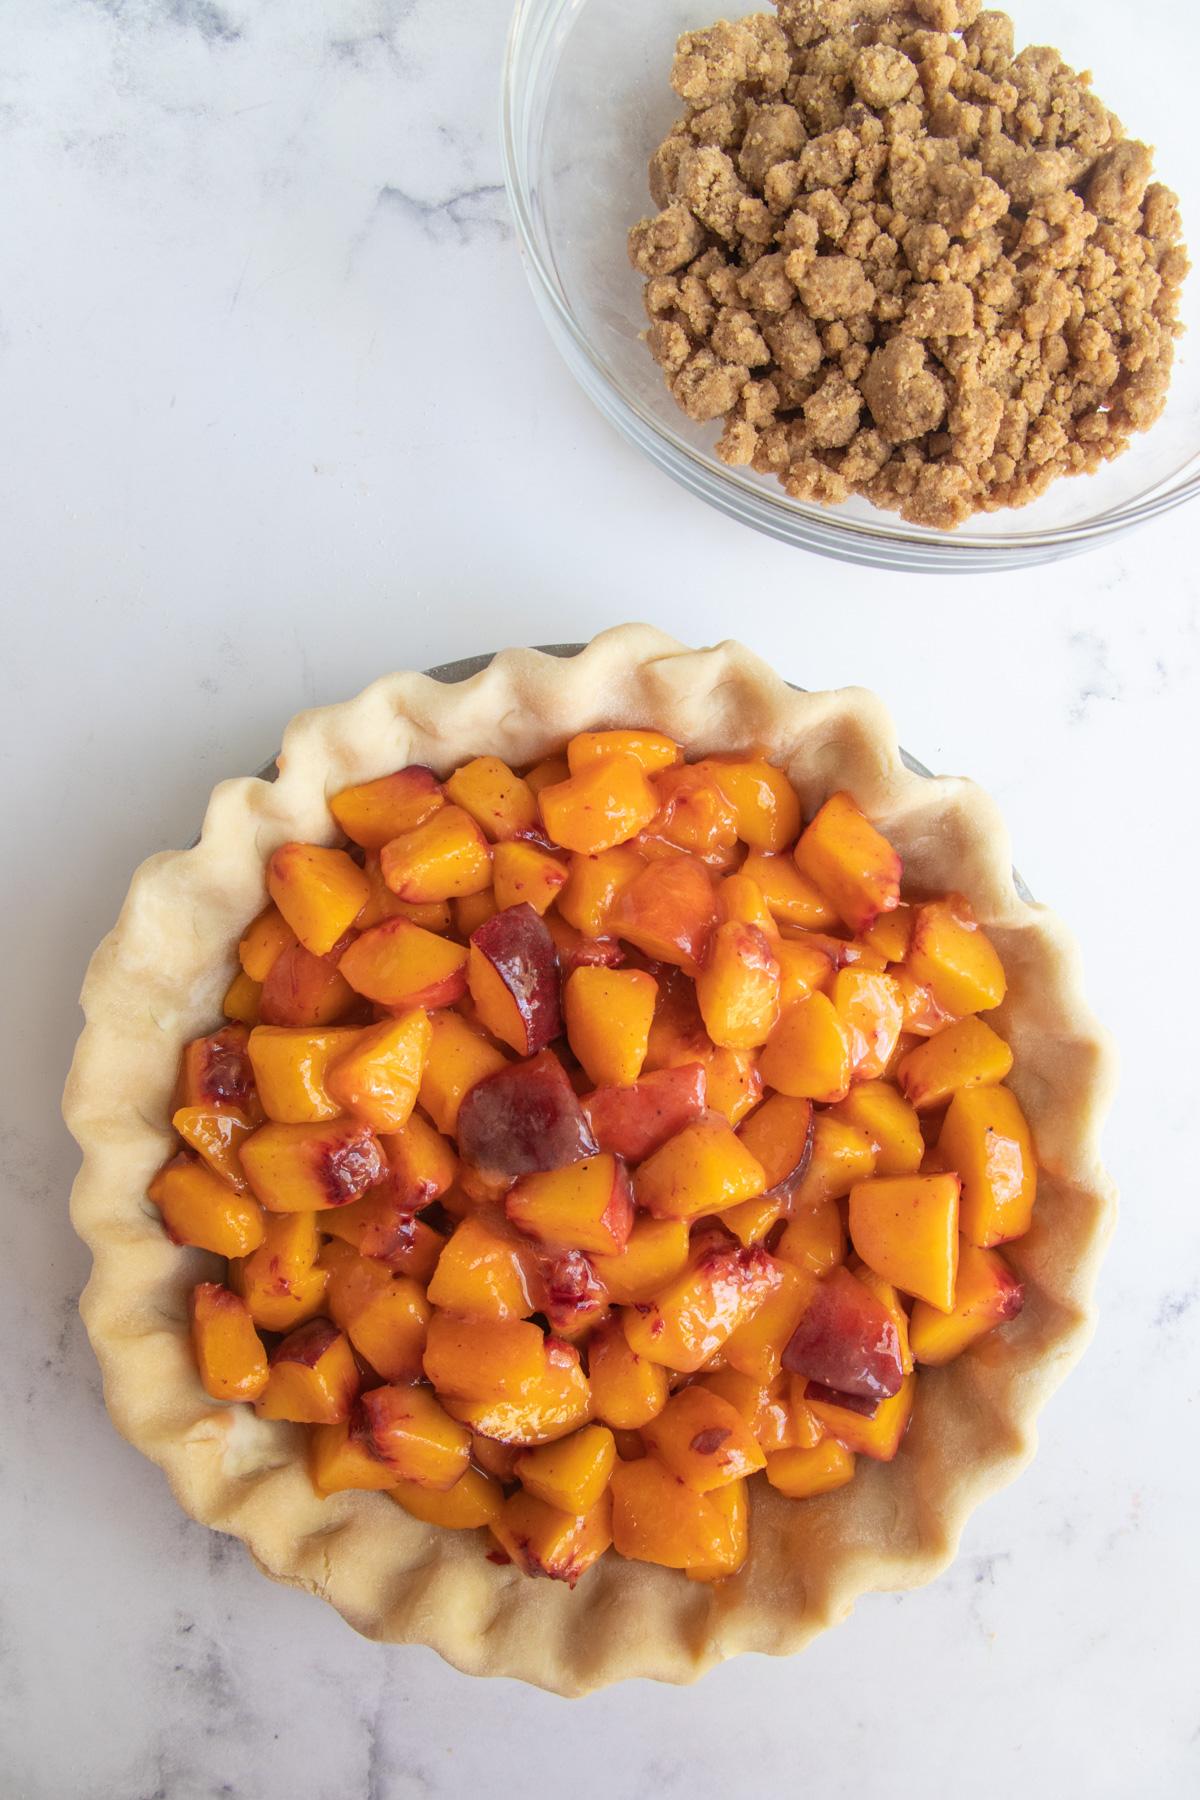 Peaches placed in prepared pie dough next to the bowl fo brown sugar crumble